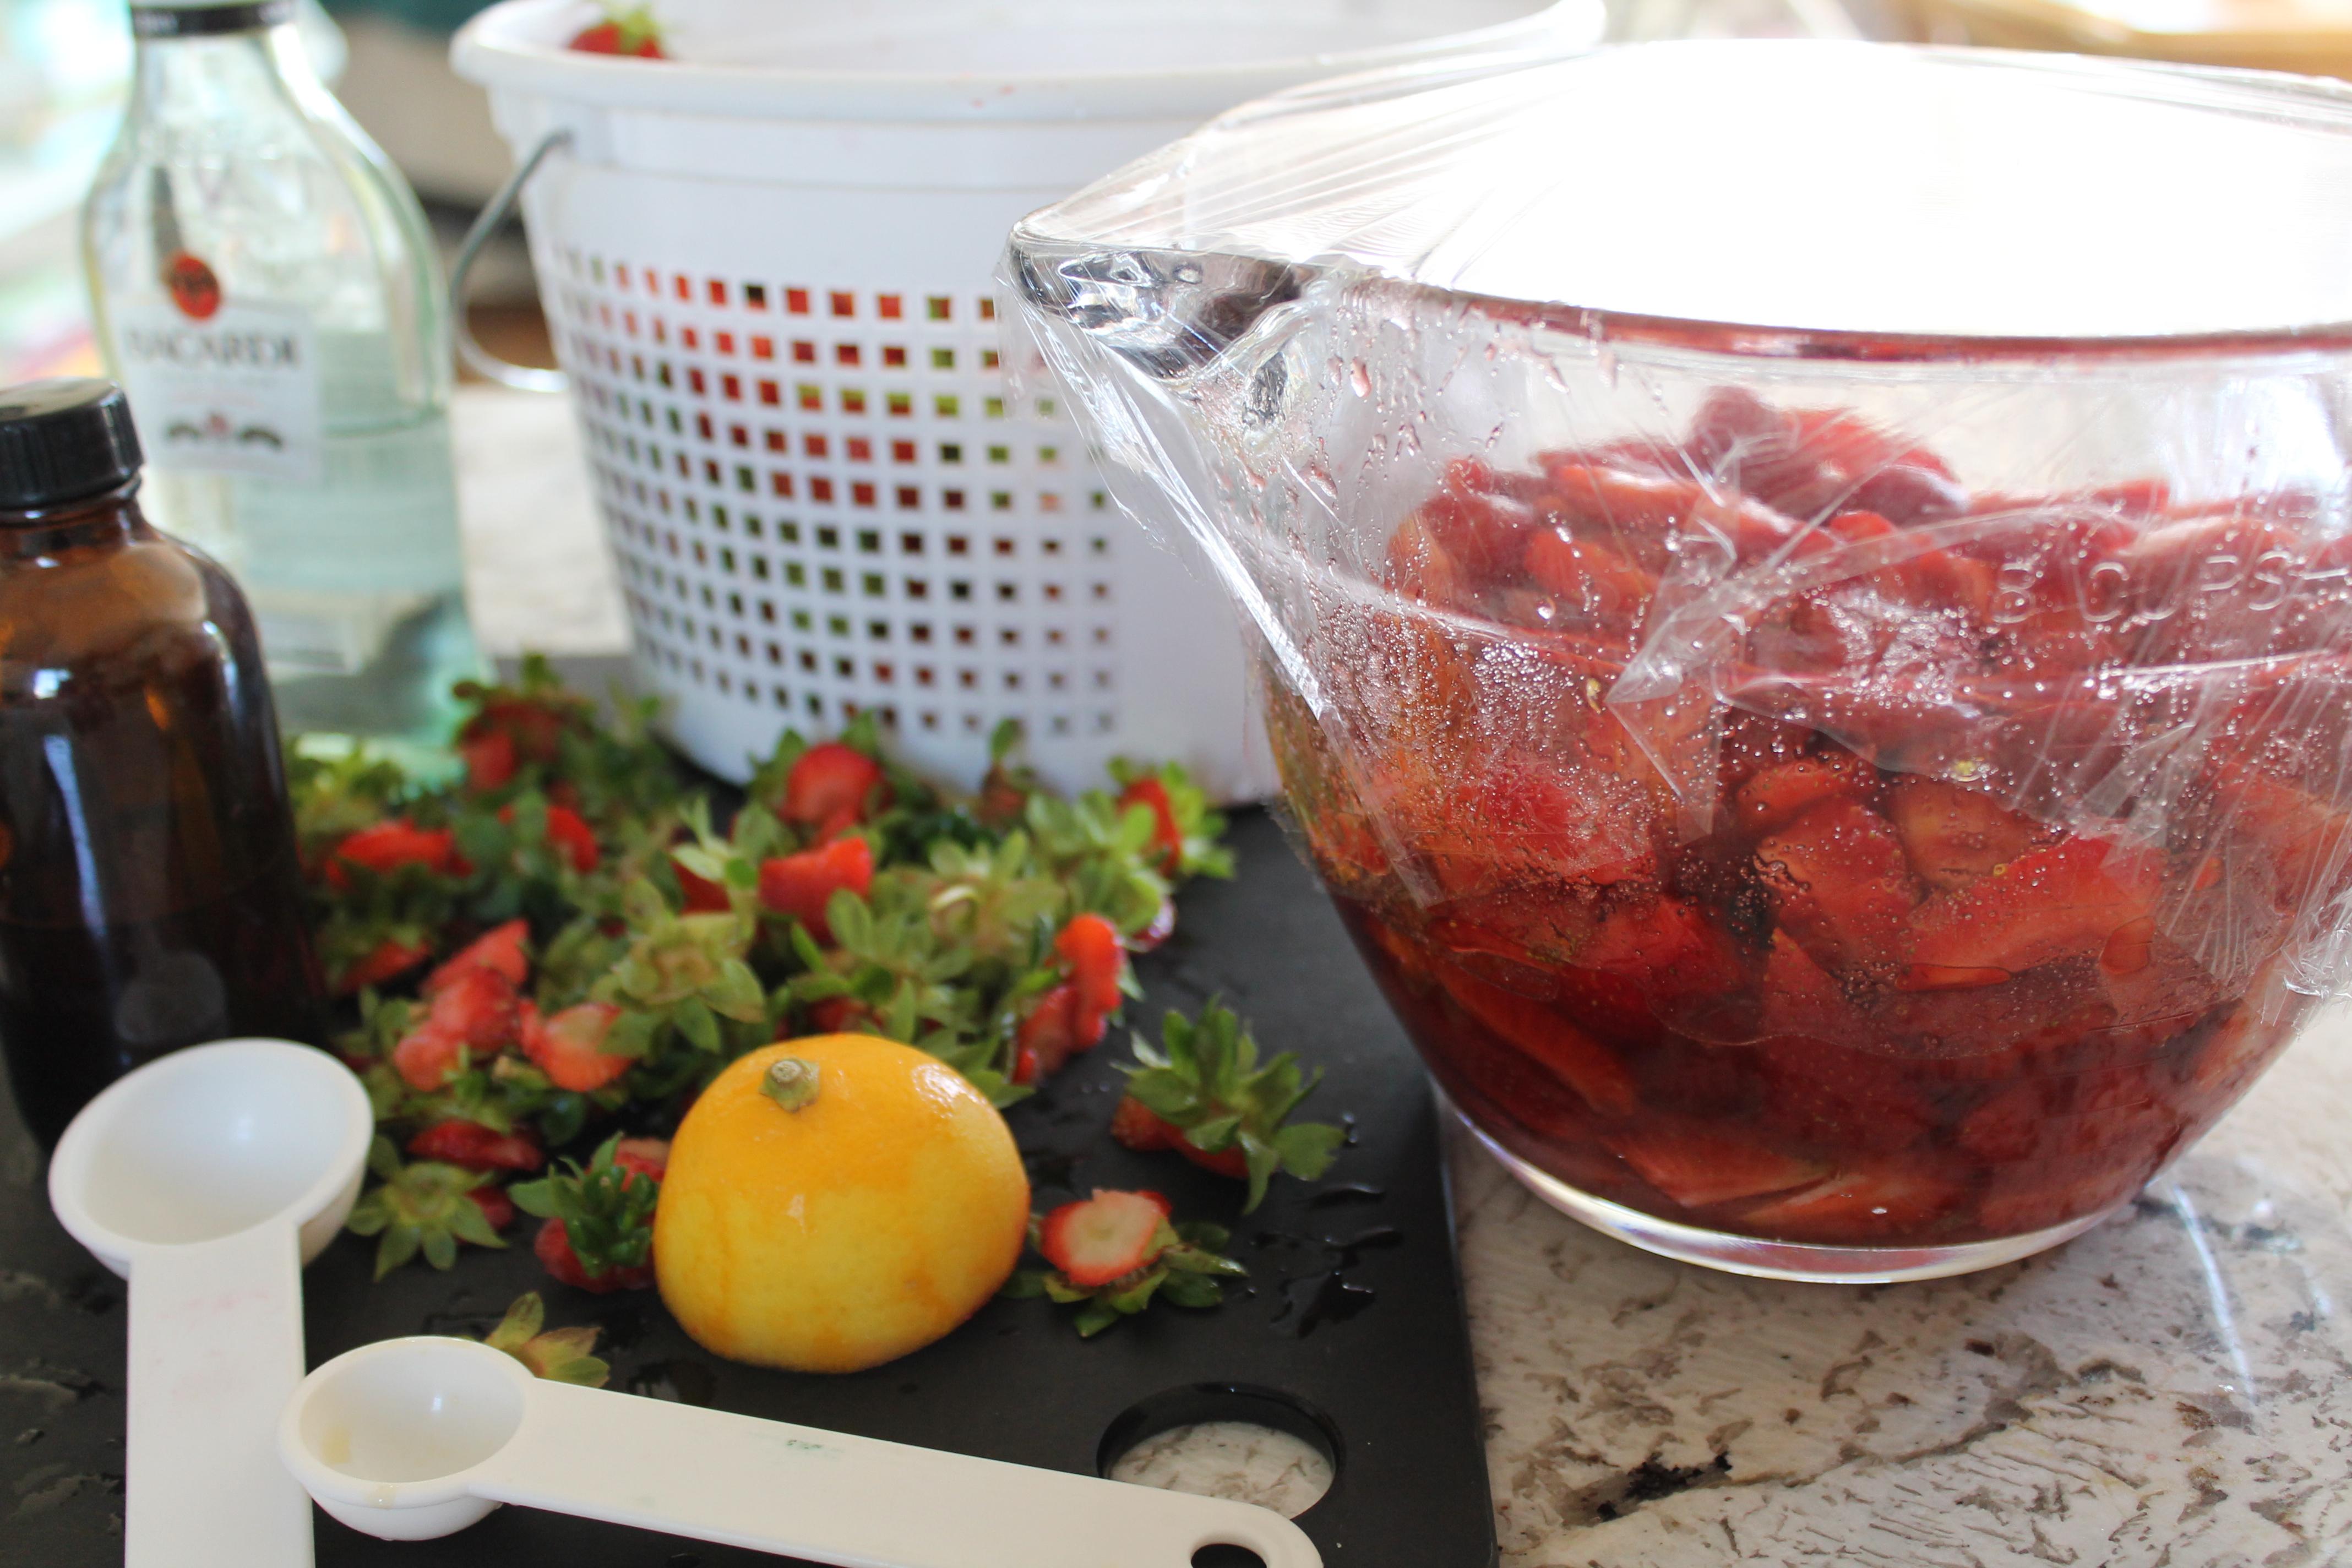 Macerating Strawberries